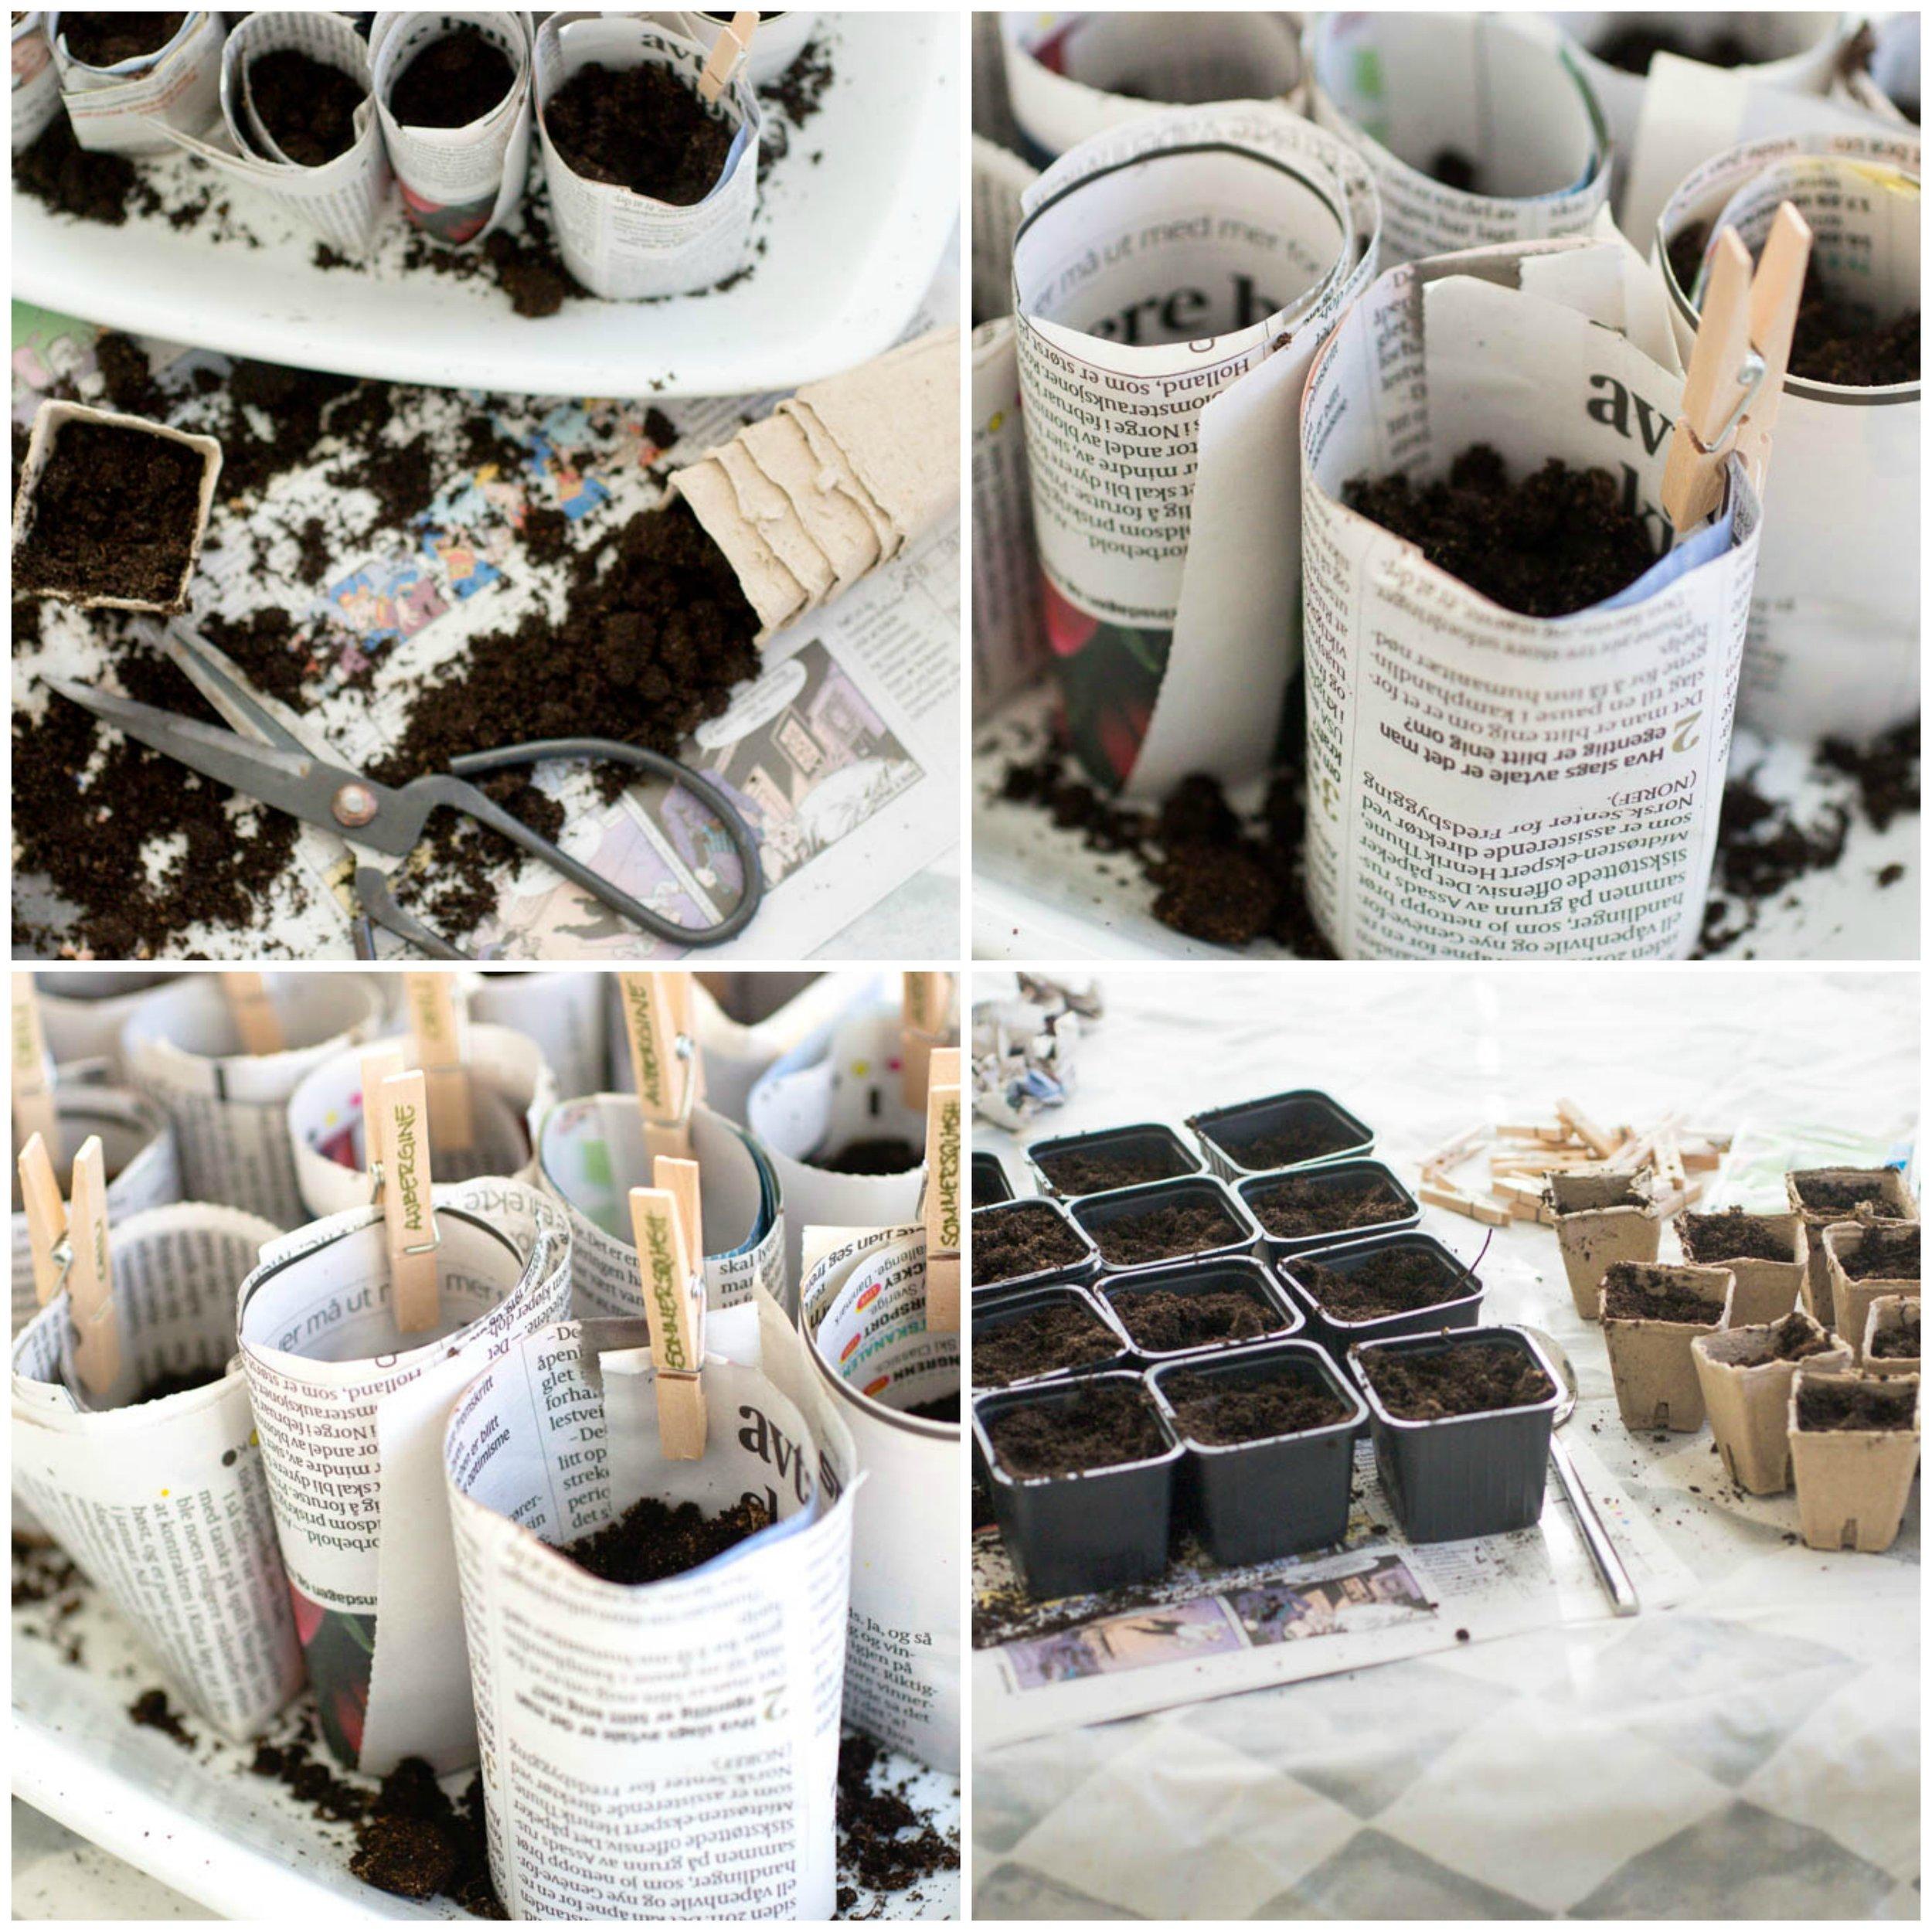 urteroggrønnsaksplanting